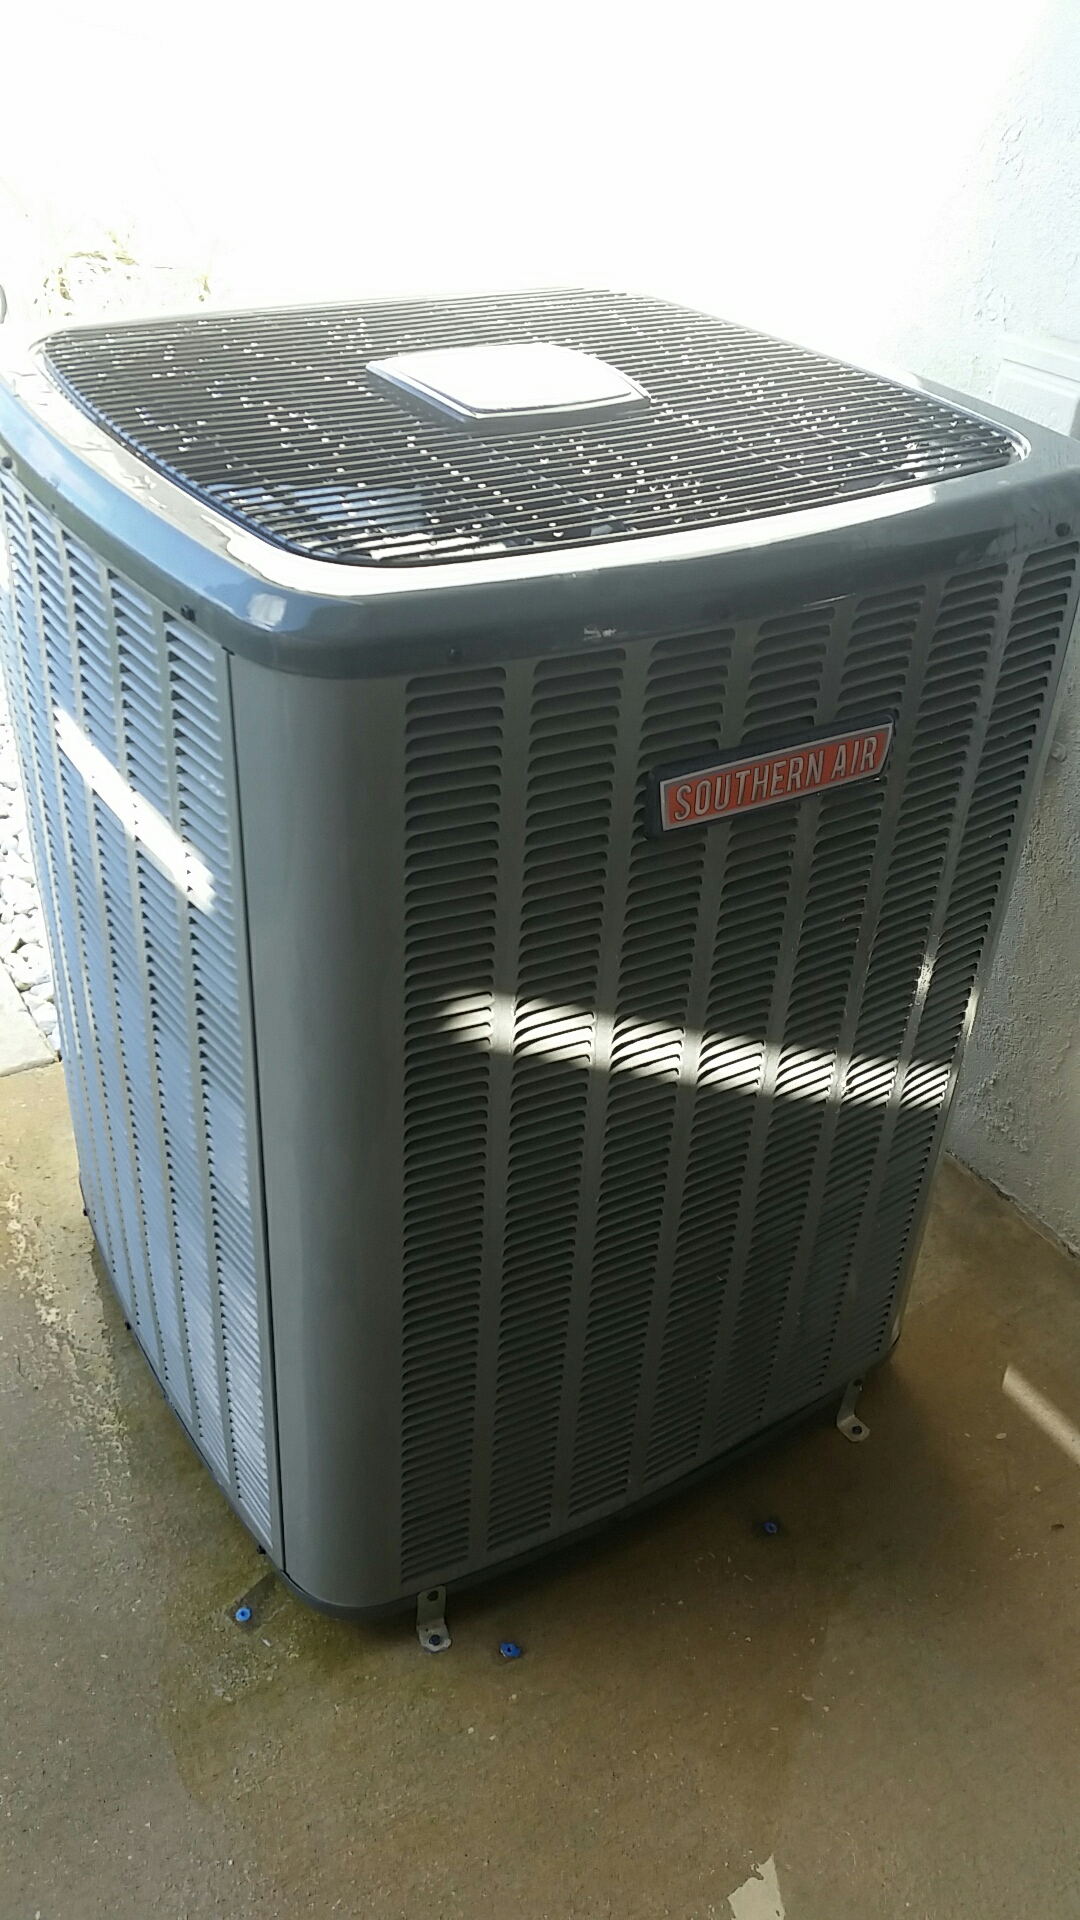 East Palatka, FL - Maintenance on Southern Air comfort system heat pump